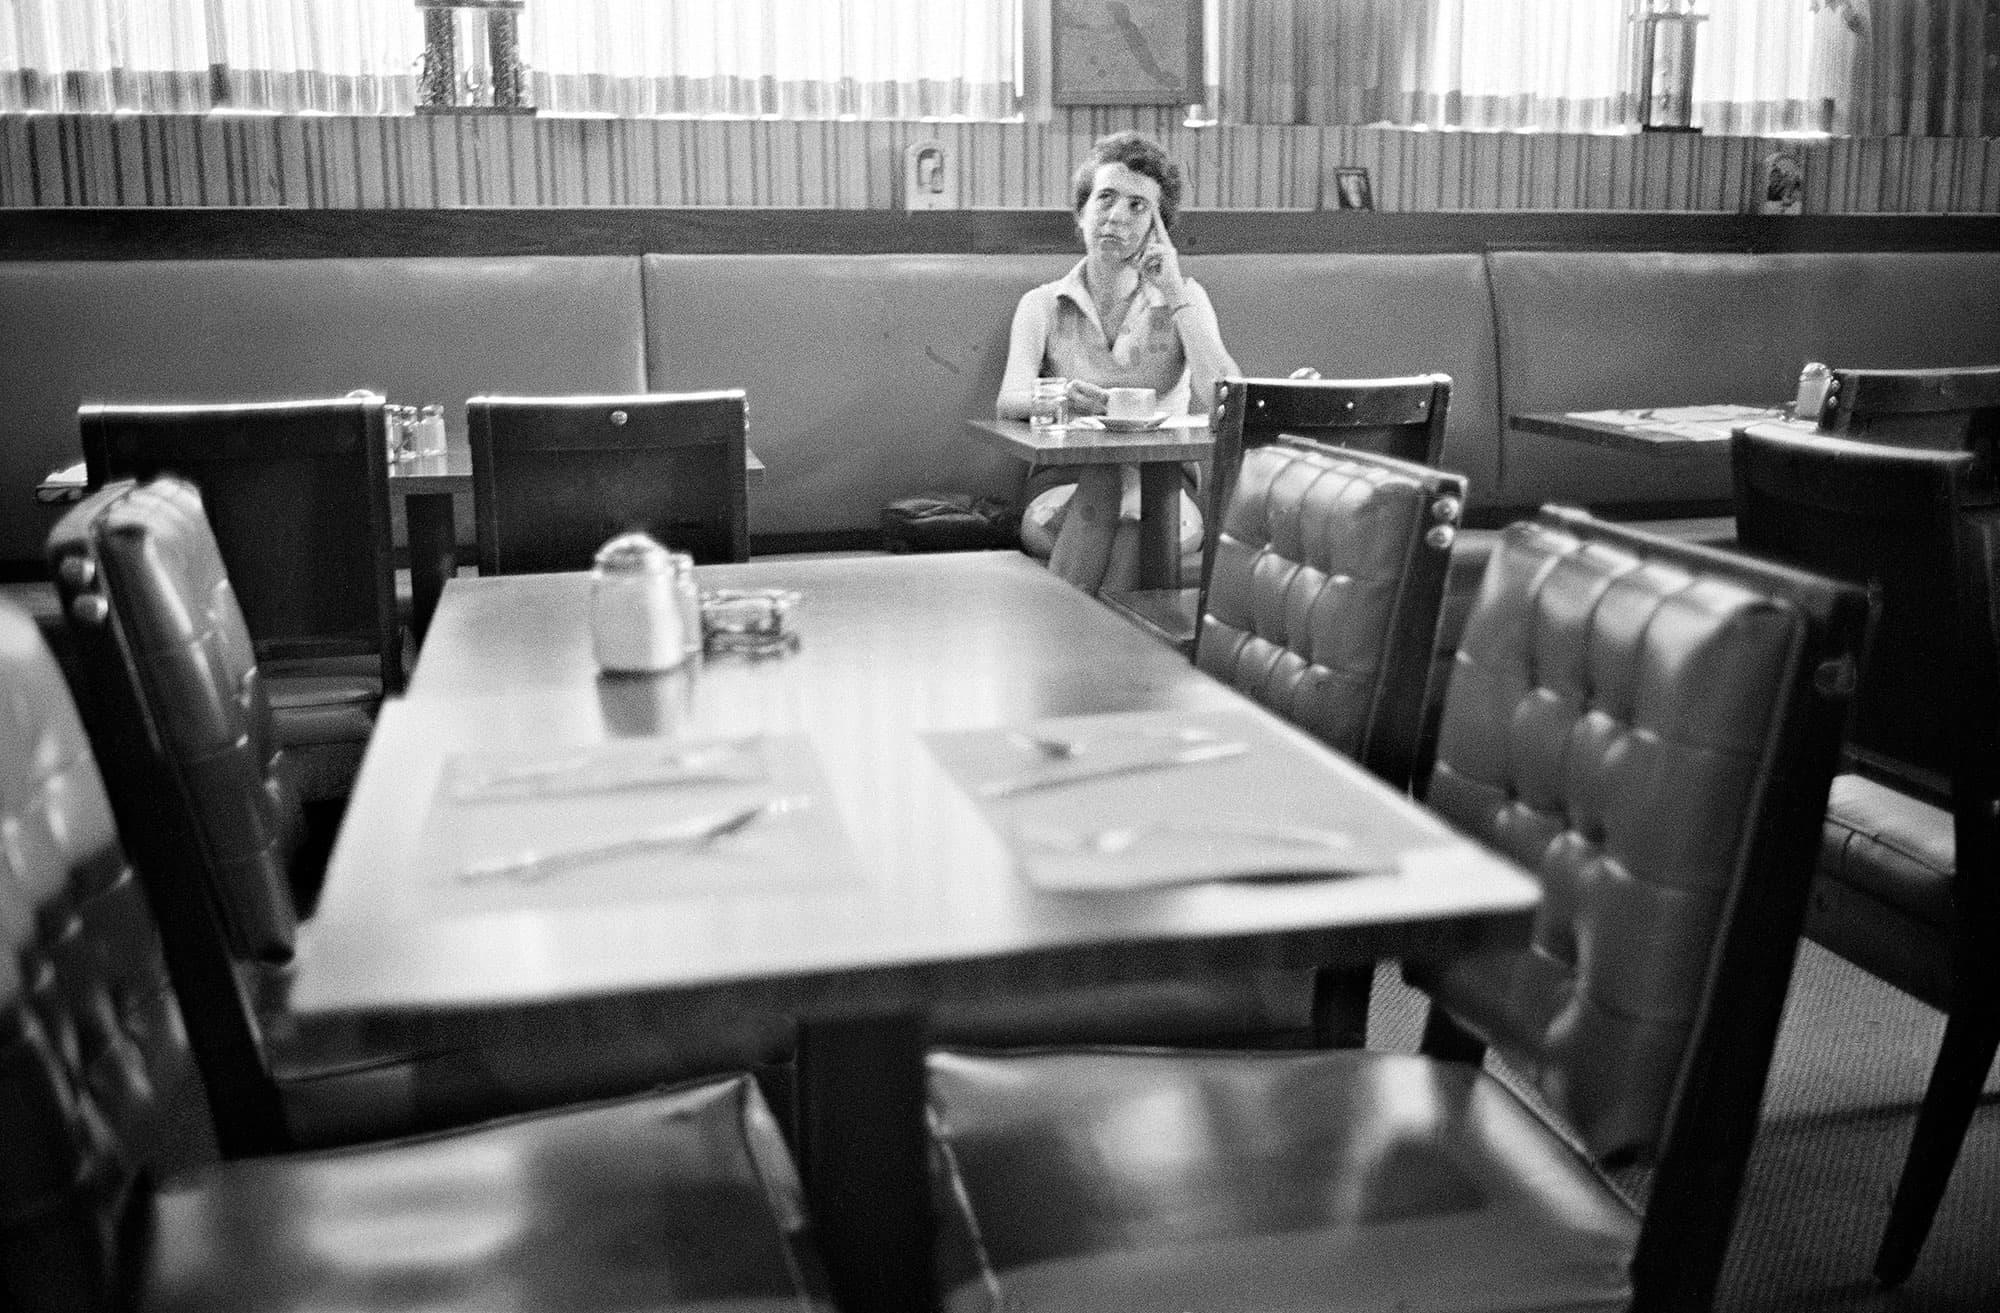 arthur-lazar-Cafe-Pennsylvania-1982